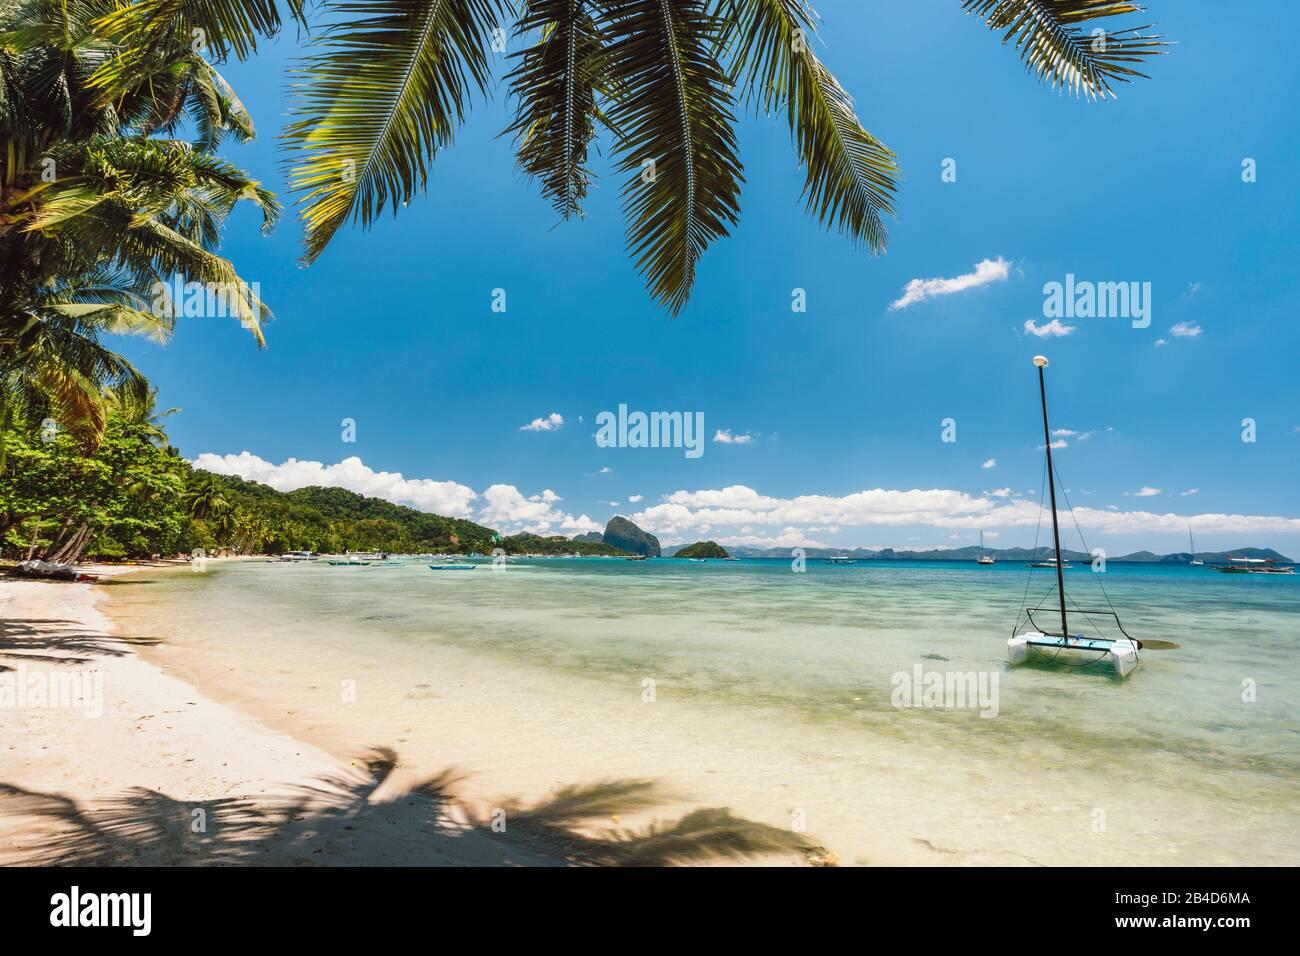 Beautiful exotic travel background, Tropical blue ocean lagoon with catamaran boat , Corong beach, El Nido, Philippines, Stock Photo